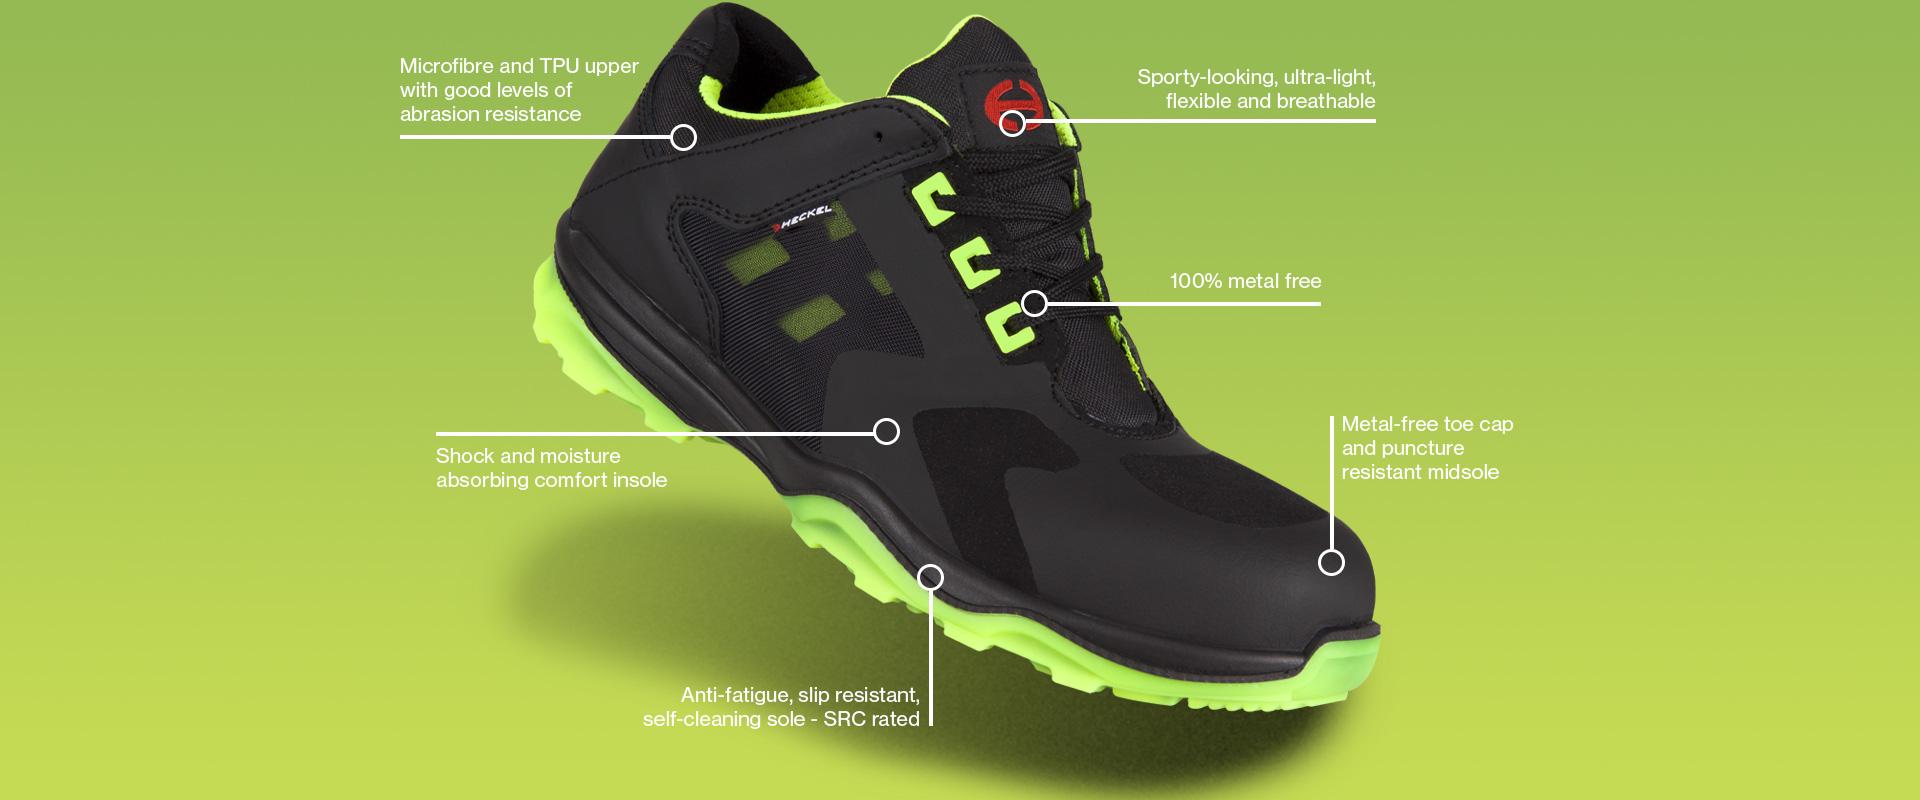 Key benefits of the Heckel Run-R 200